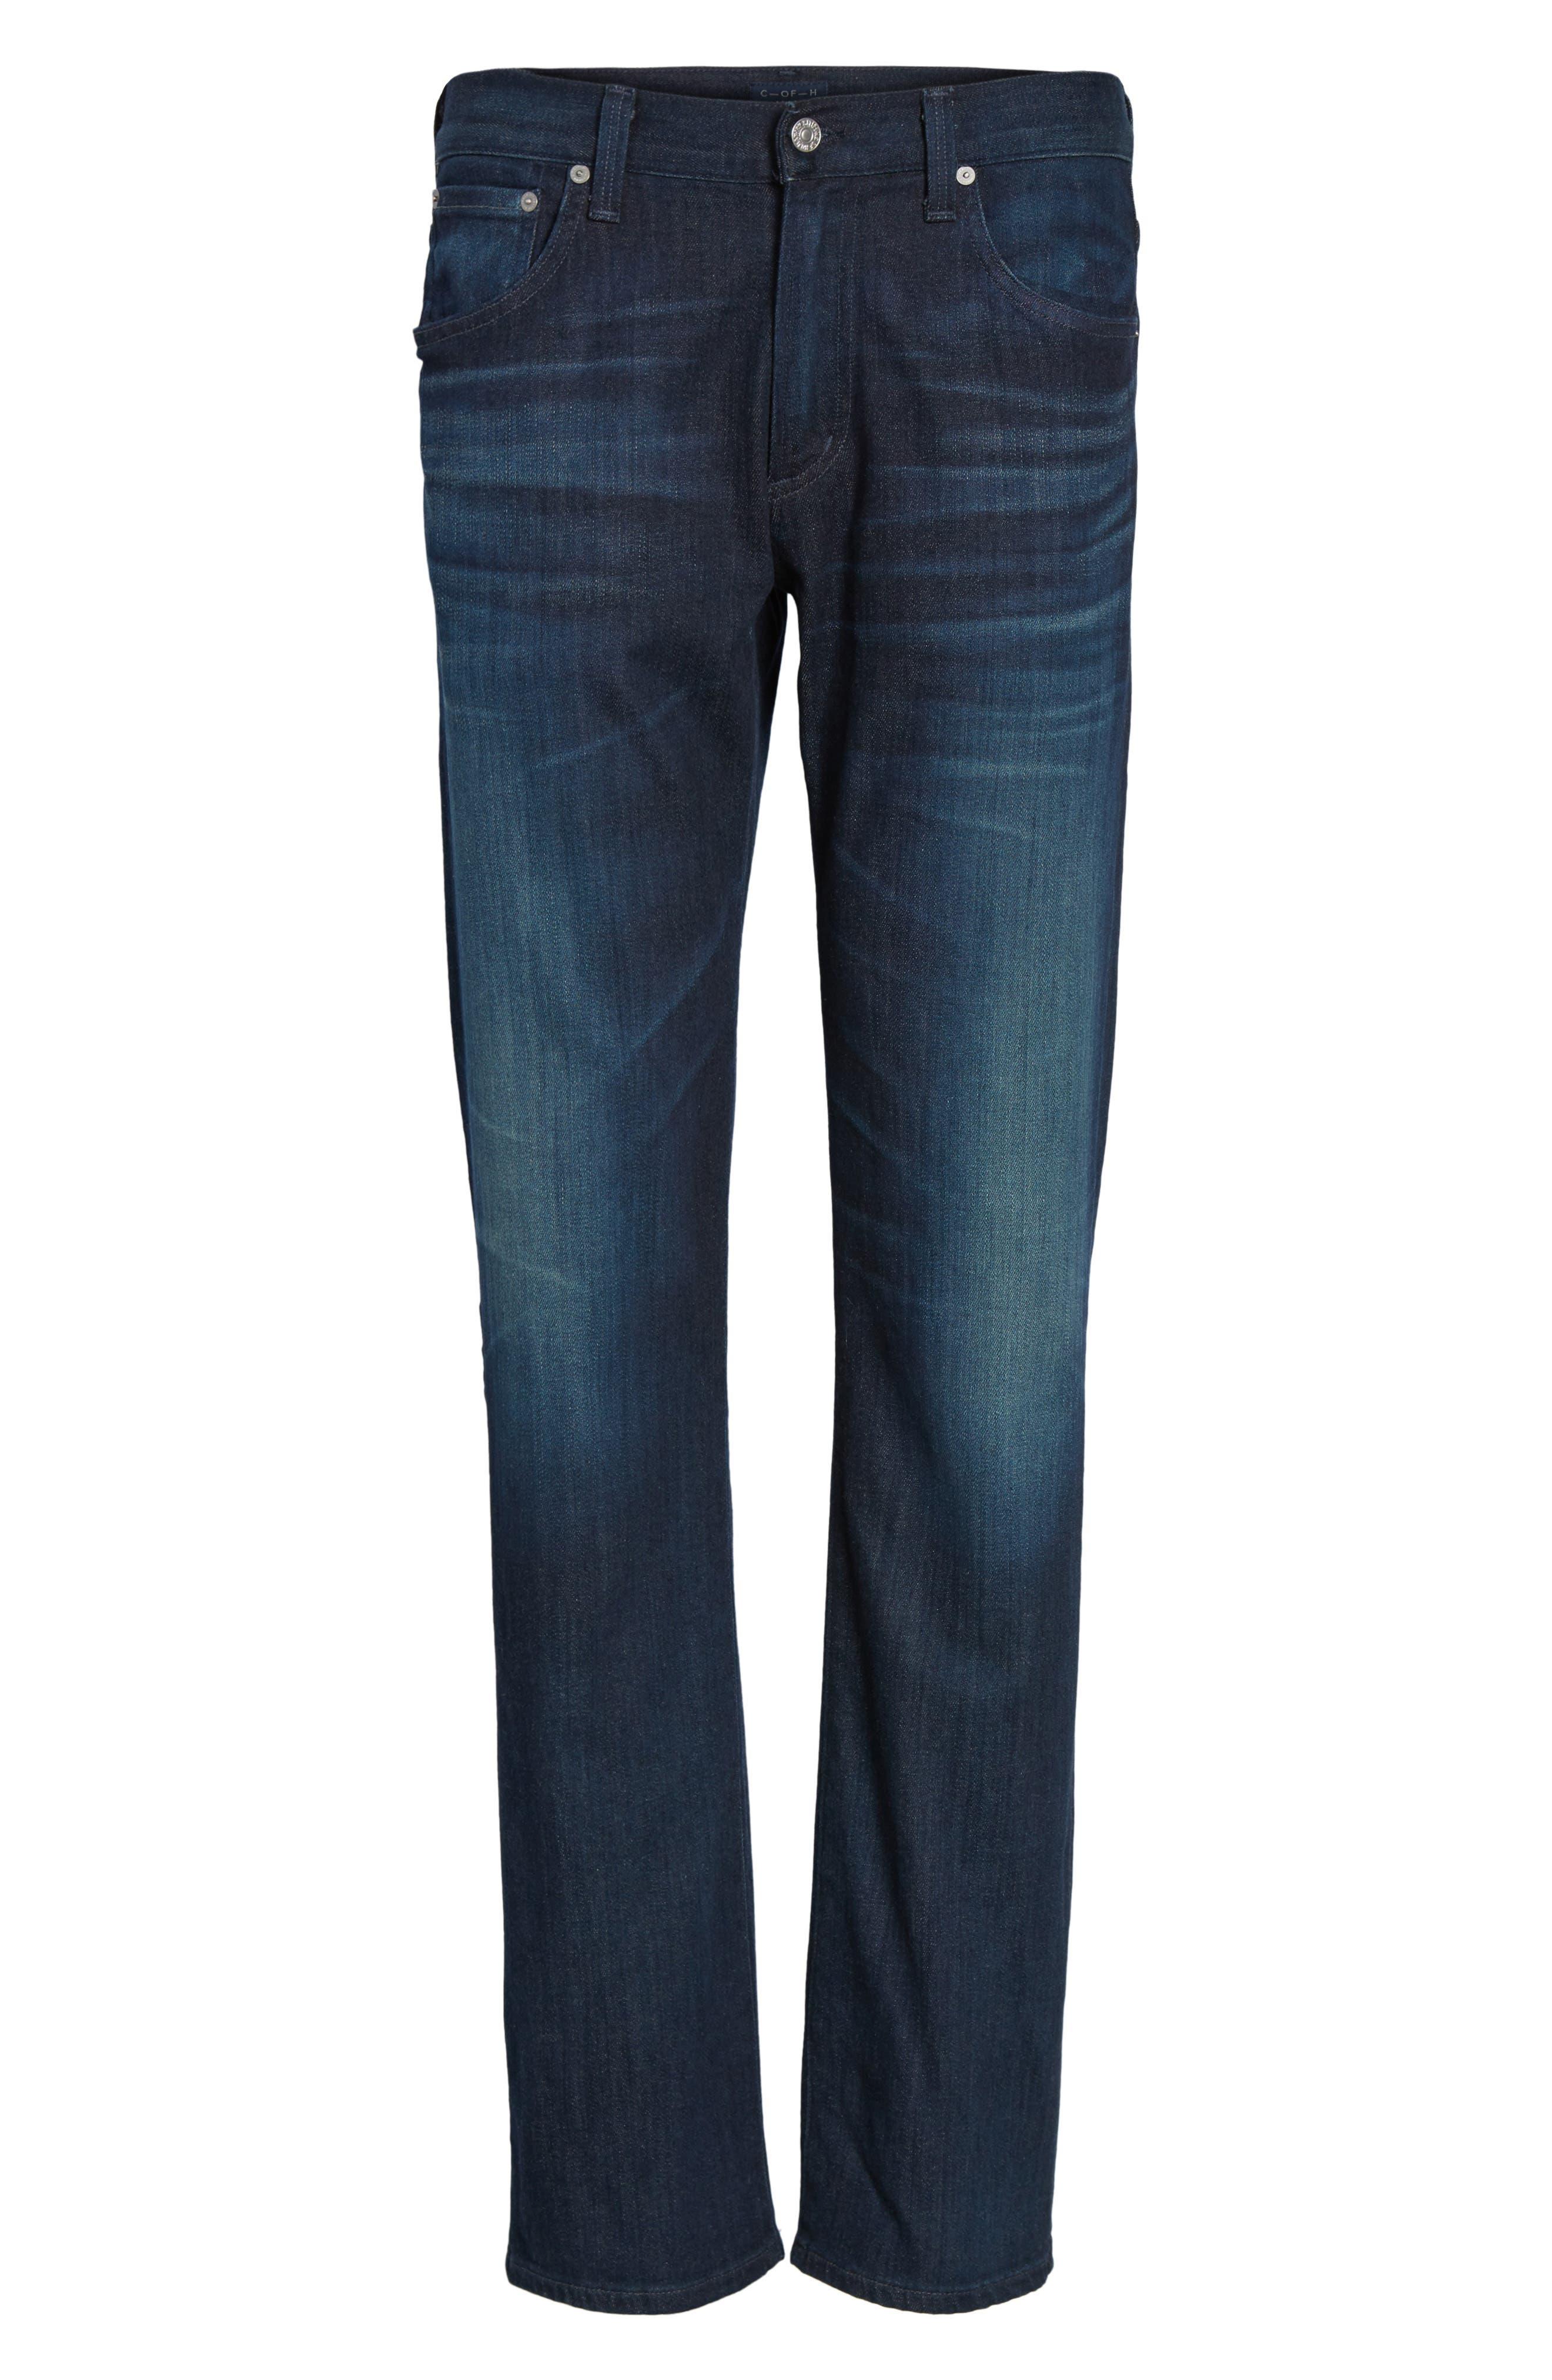 'Sid Classic' Straight Leg Jeans,                             Alternate thumbnail 7, color,                             473